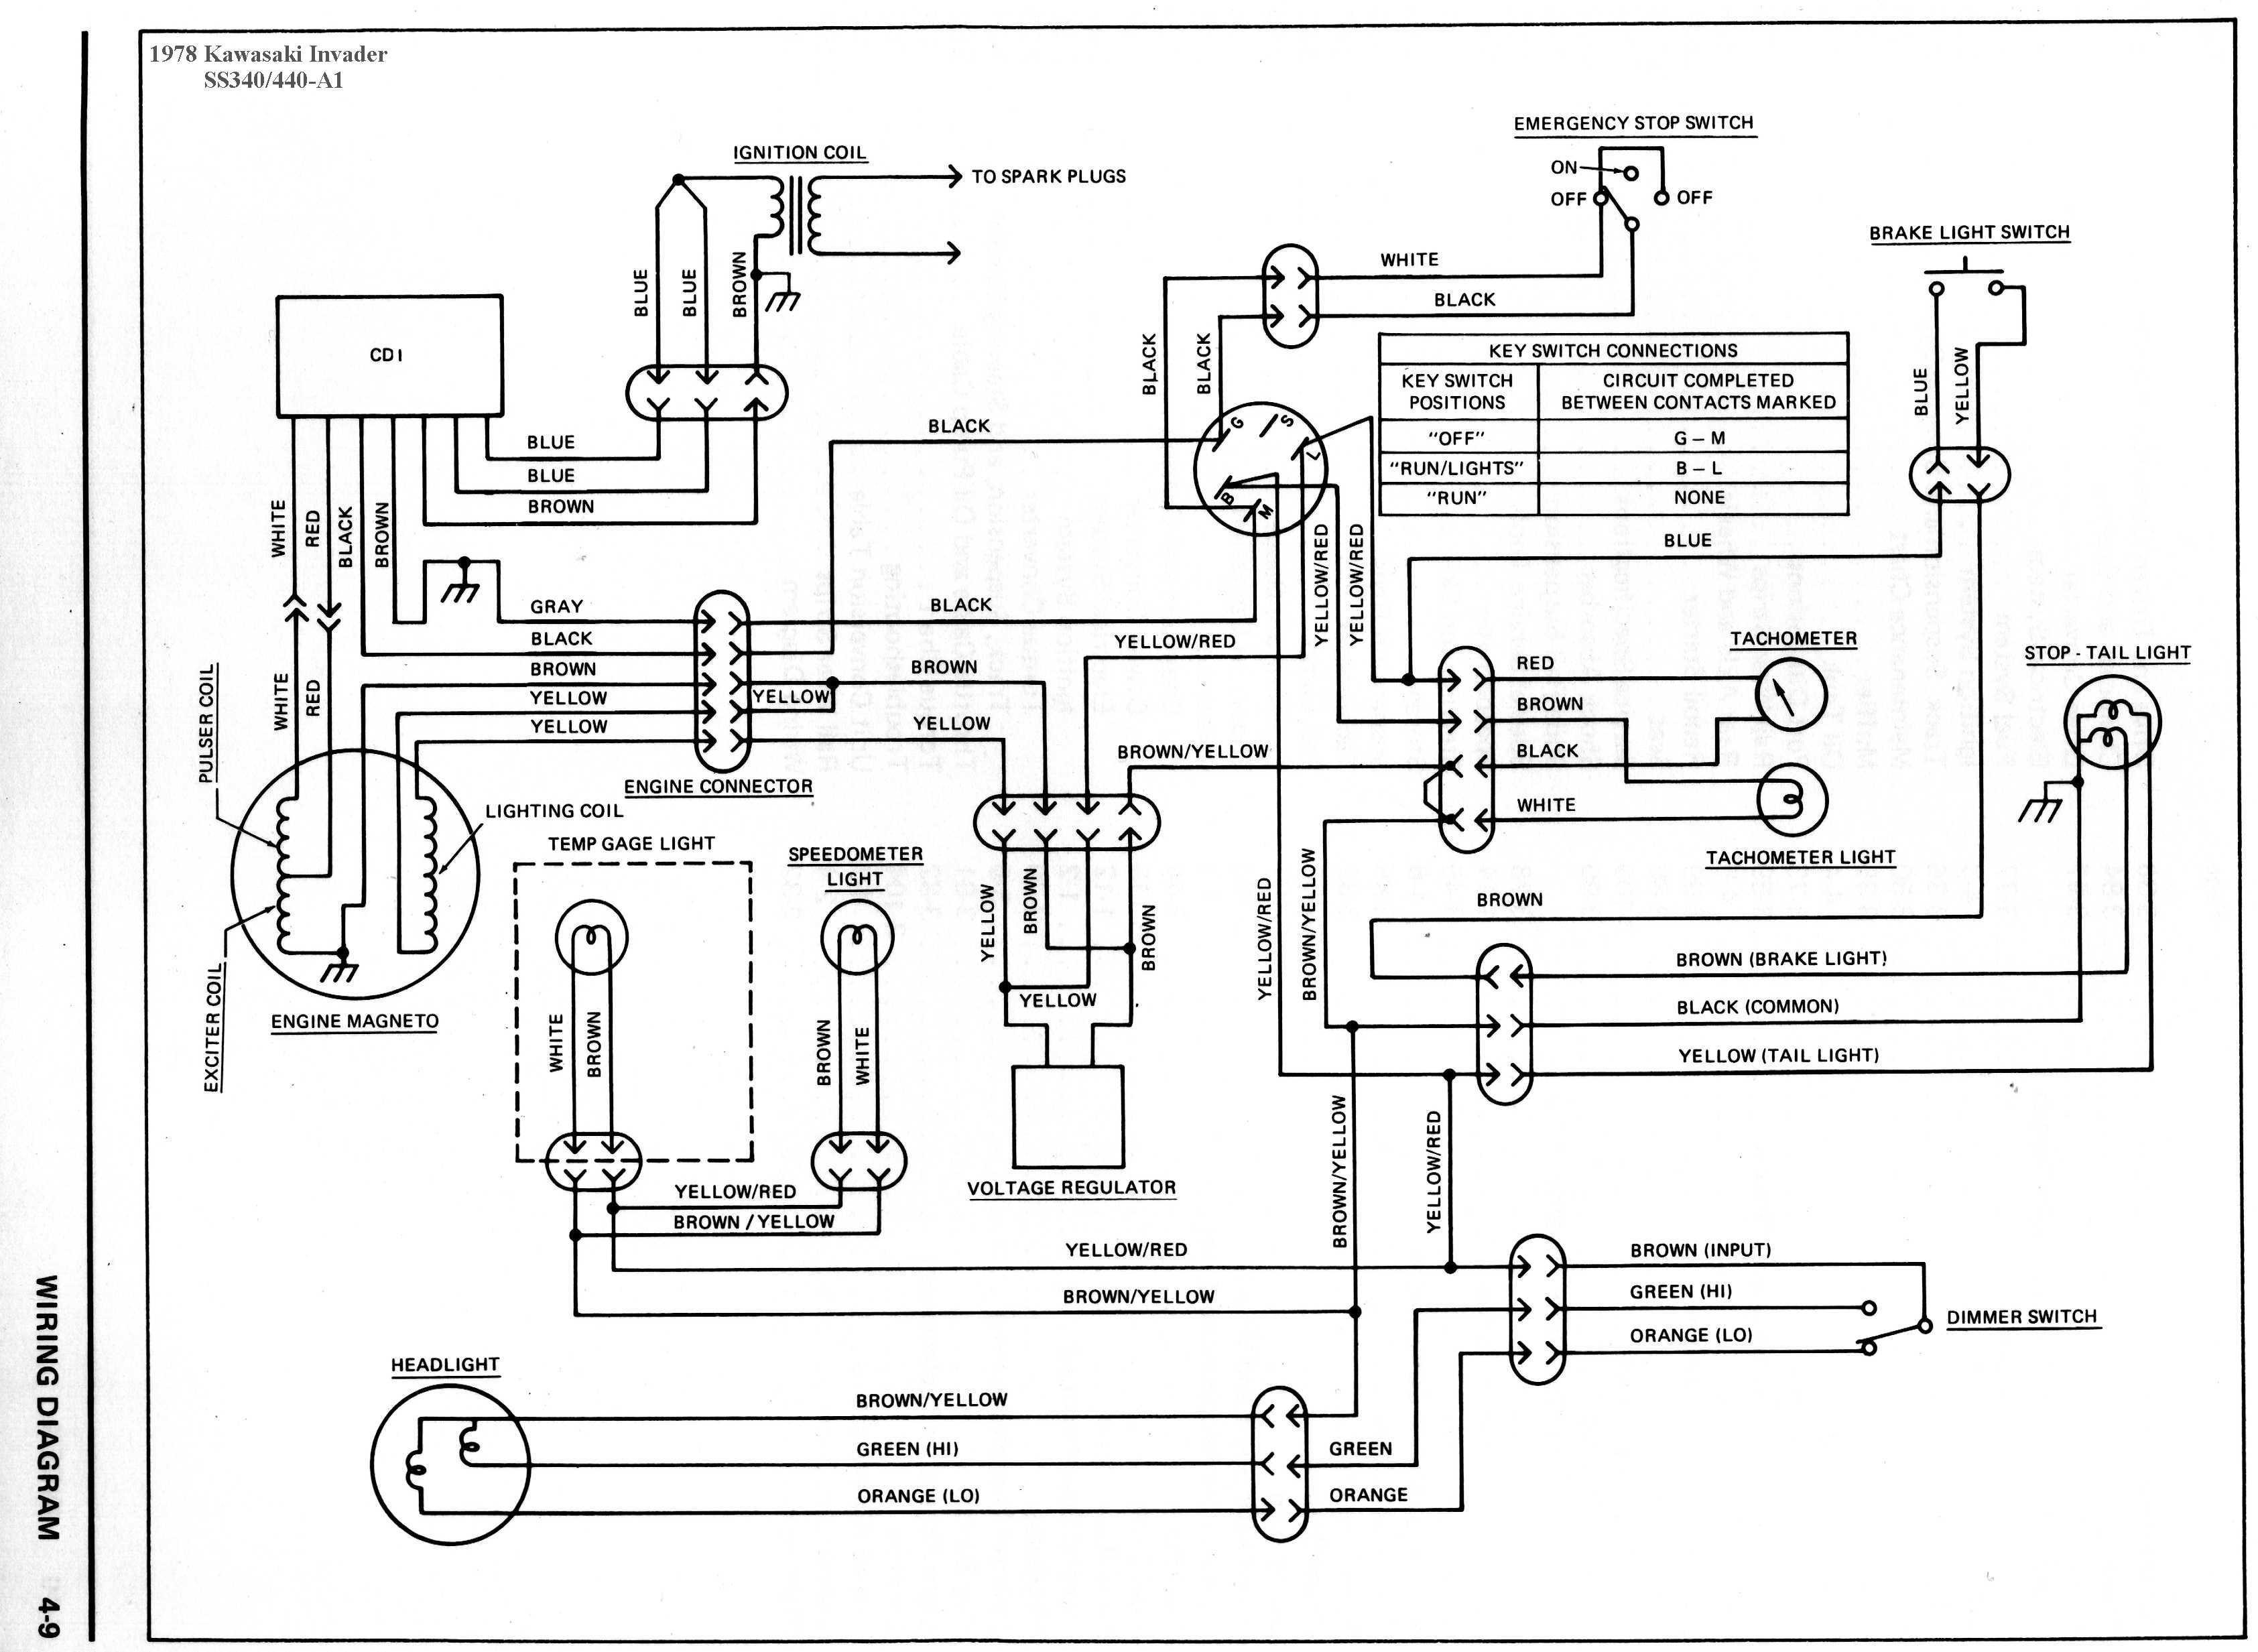 Kawasaki Mule Wiring Harness - machine learning on